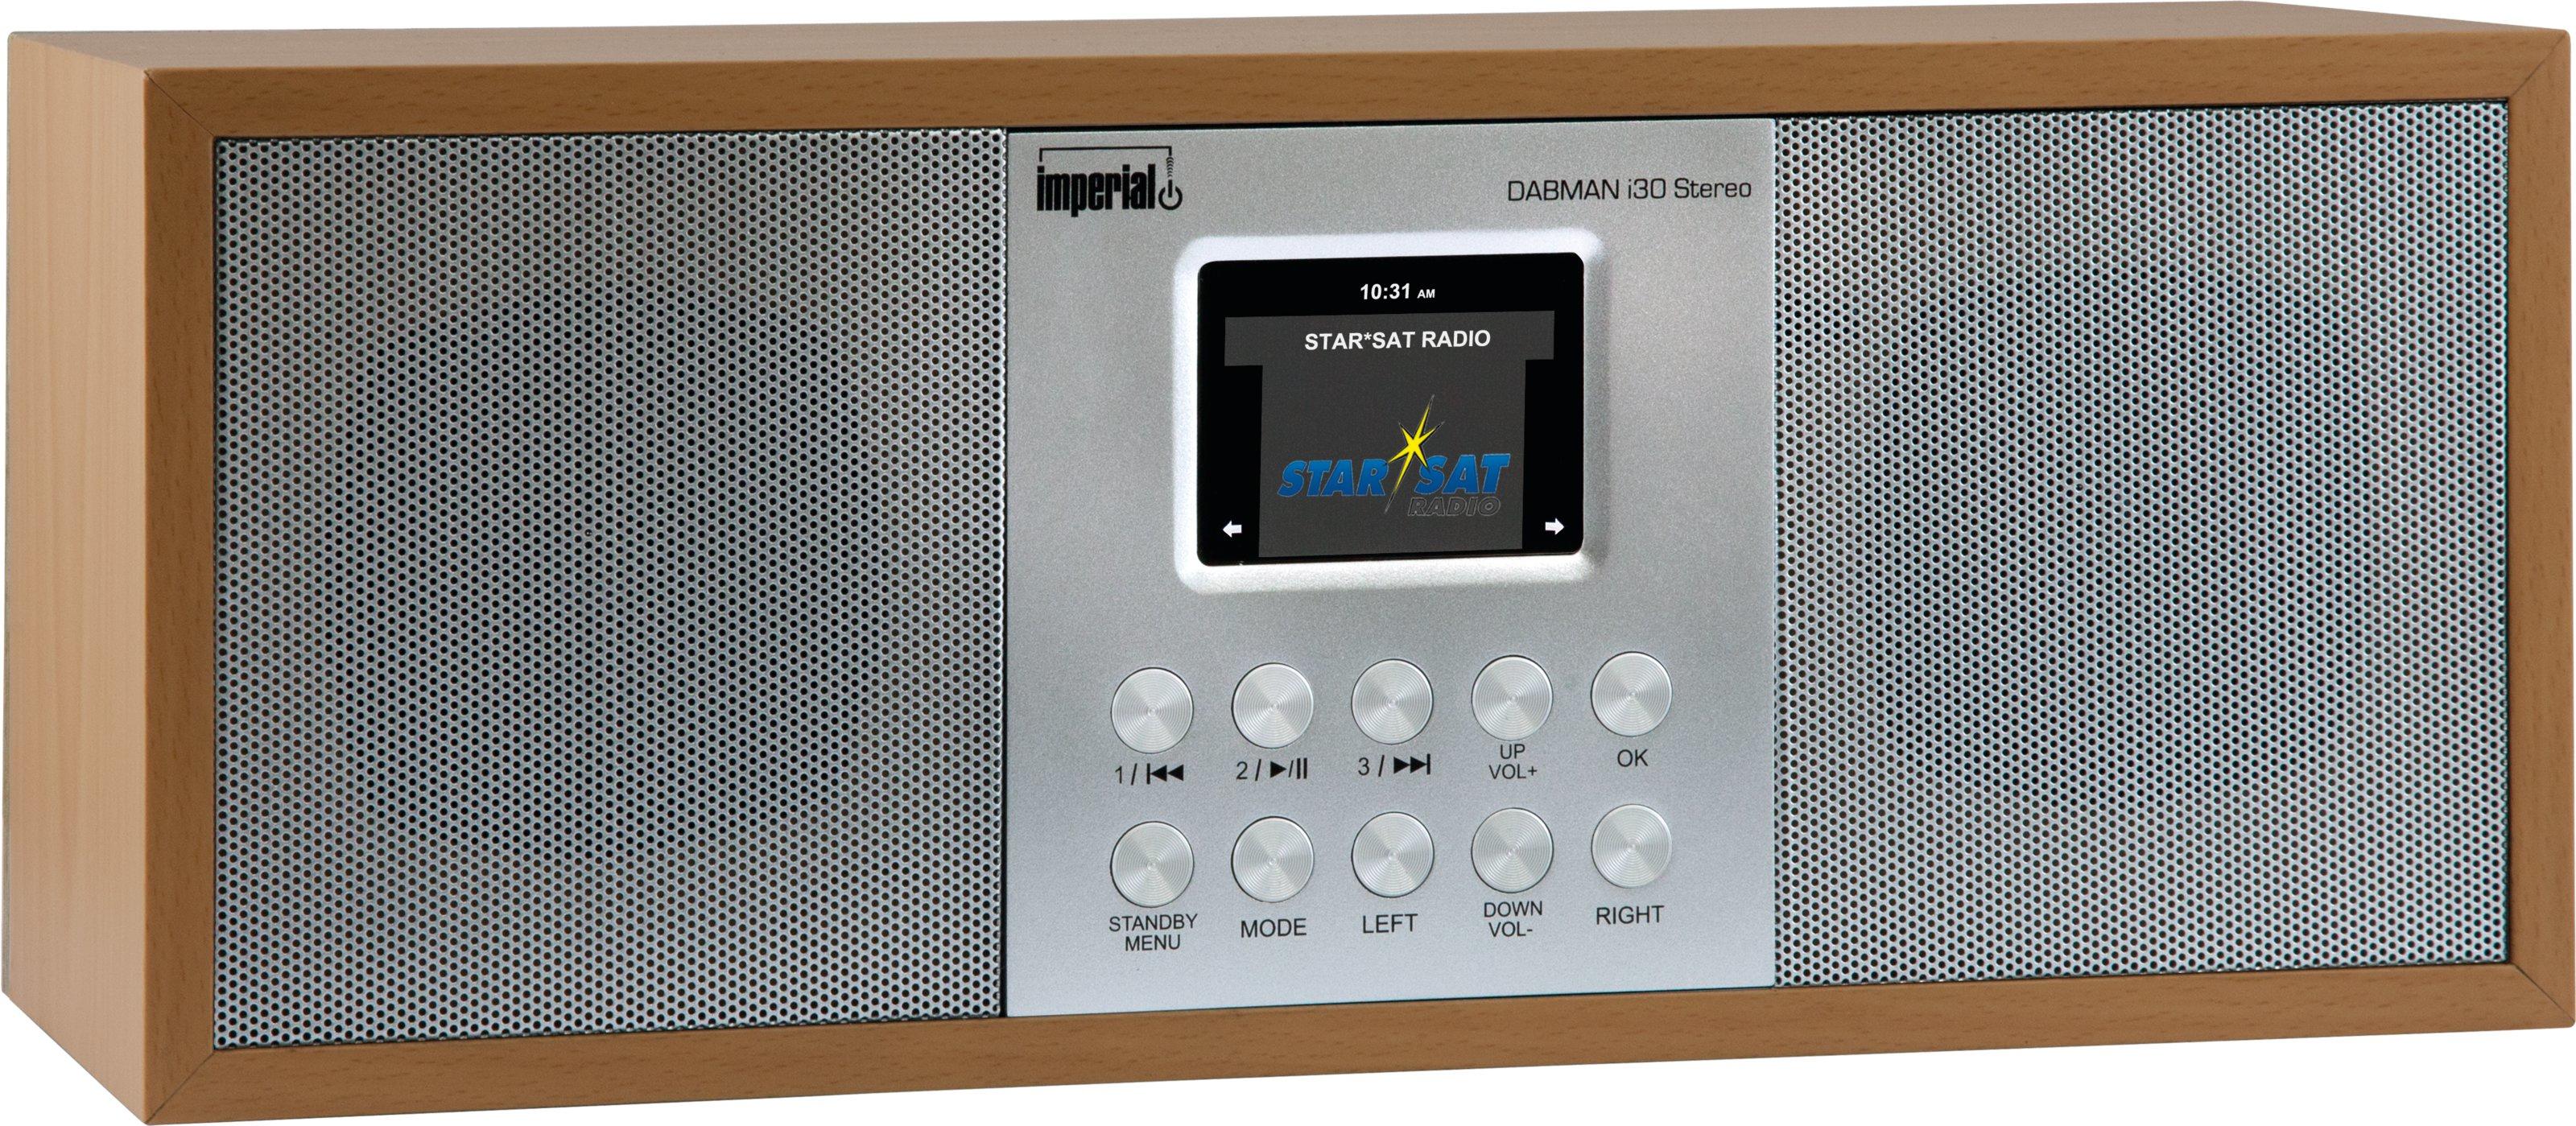 Imperial DABMAN i30 Stereo Portatile Analogico e digitale Legno